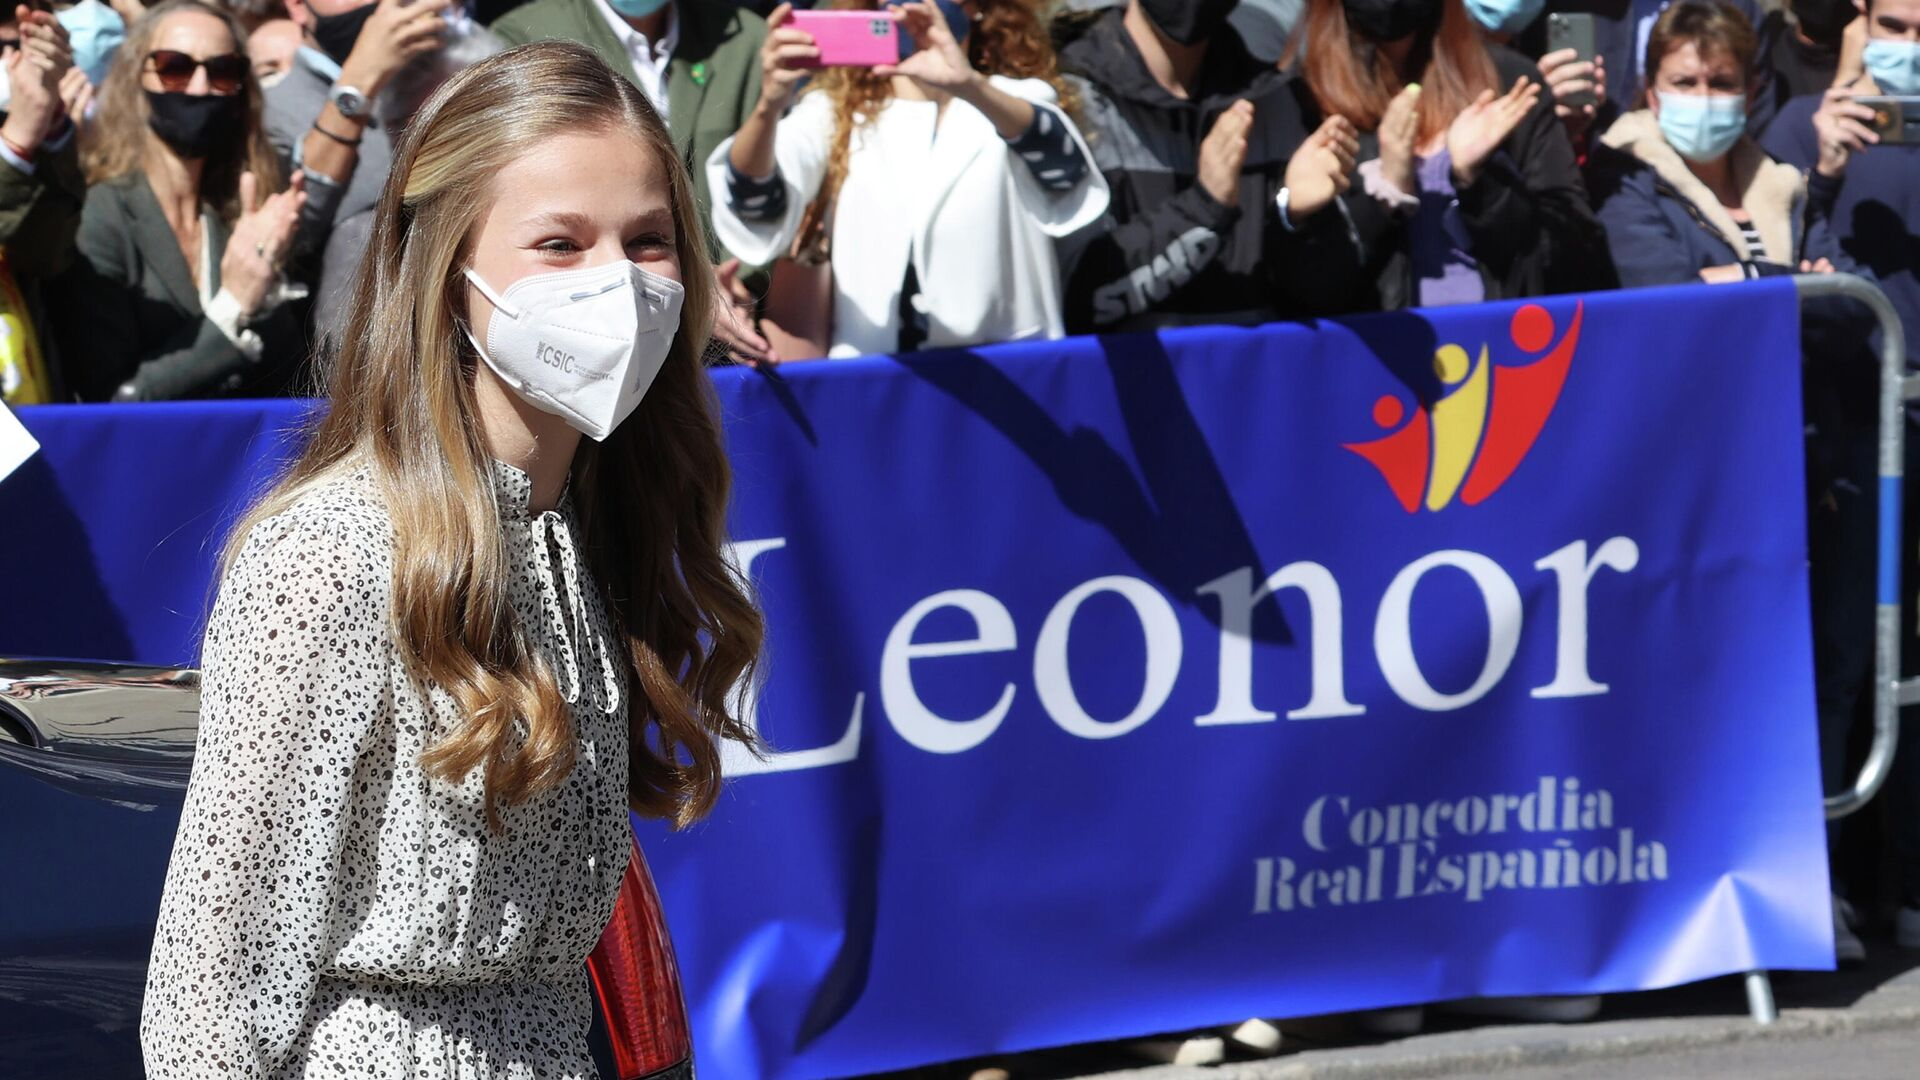 La Princesa Leonor llega a la Sede del Instituto Cervantes, en Madrid. 24 de marzo de 2021  - Sputnik Mundo, 1920, 22.07.2021